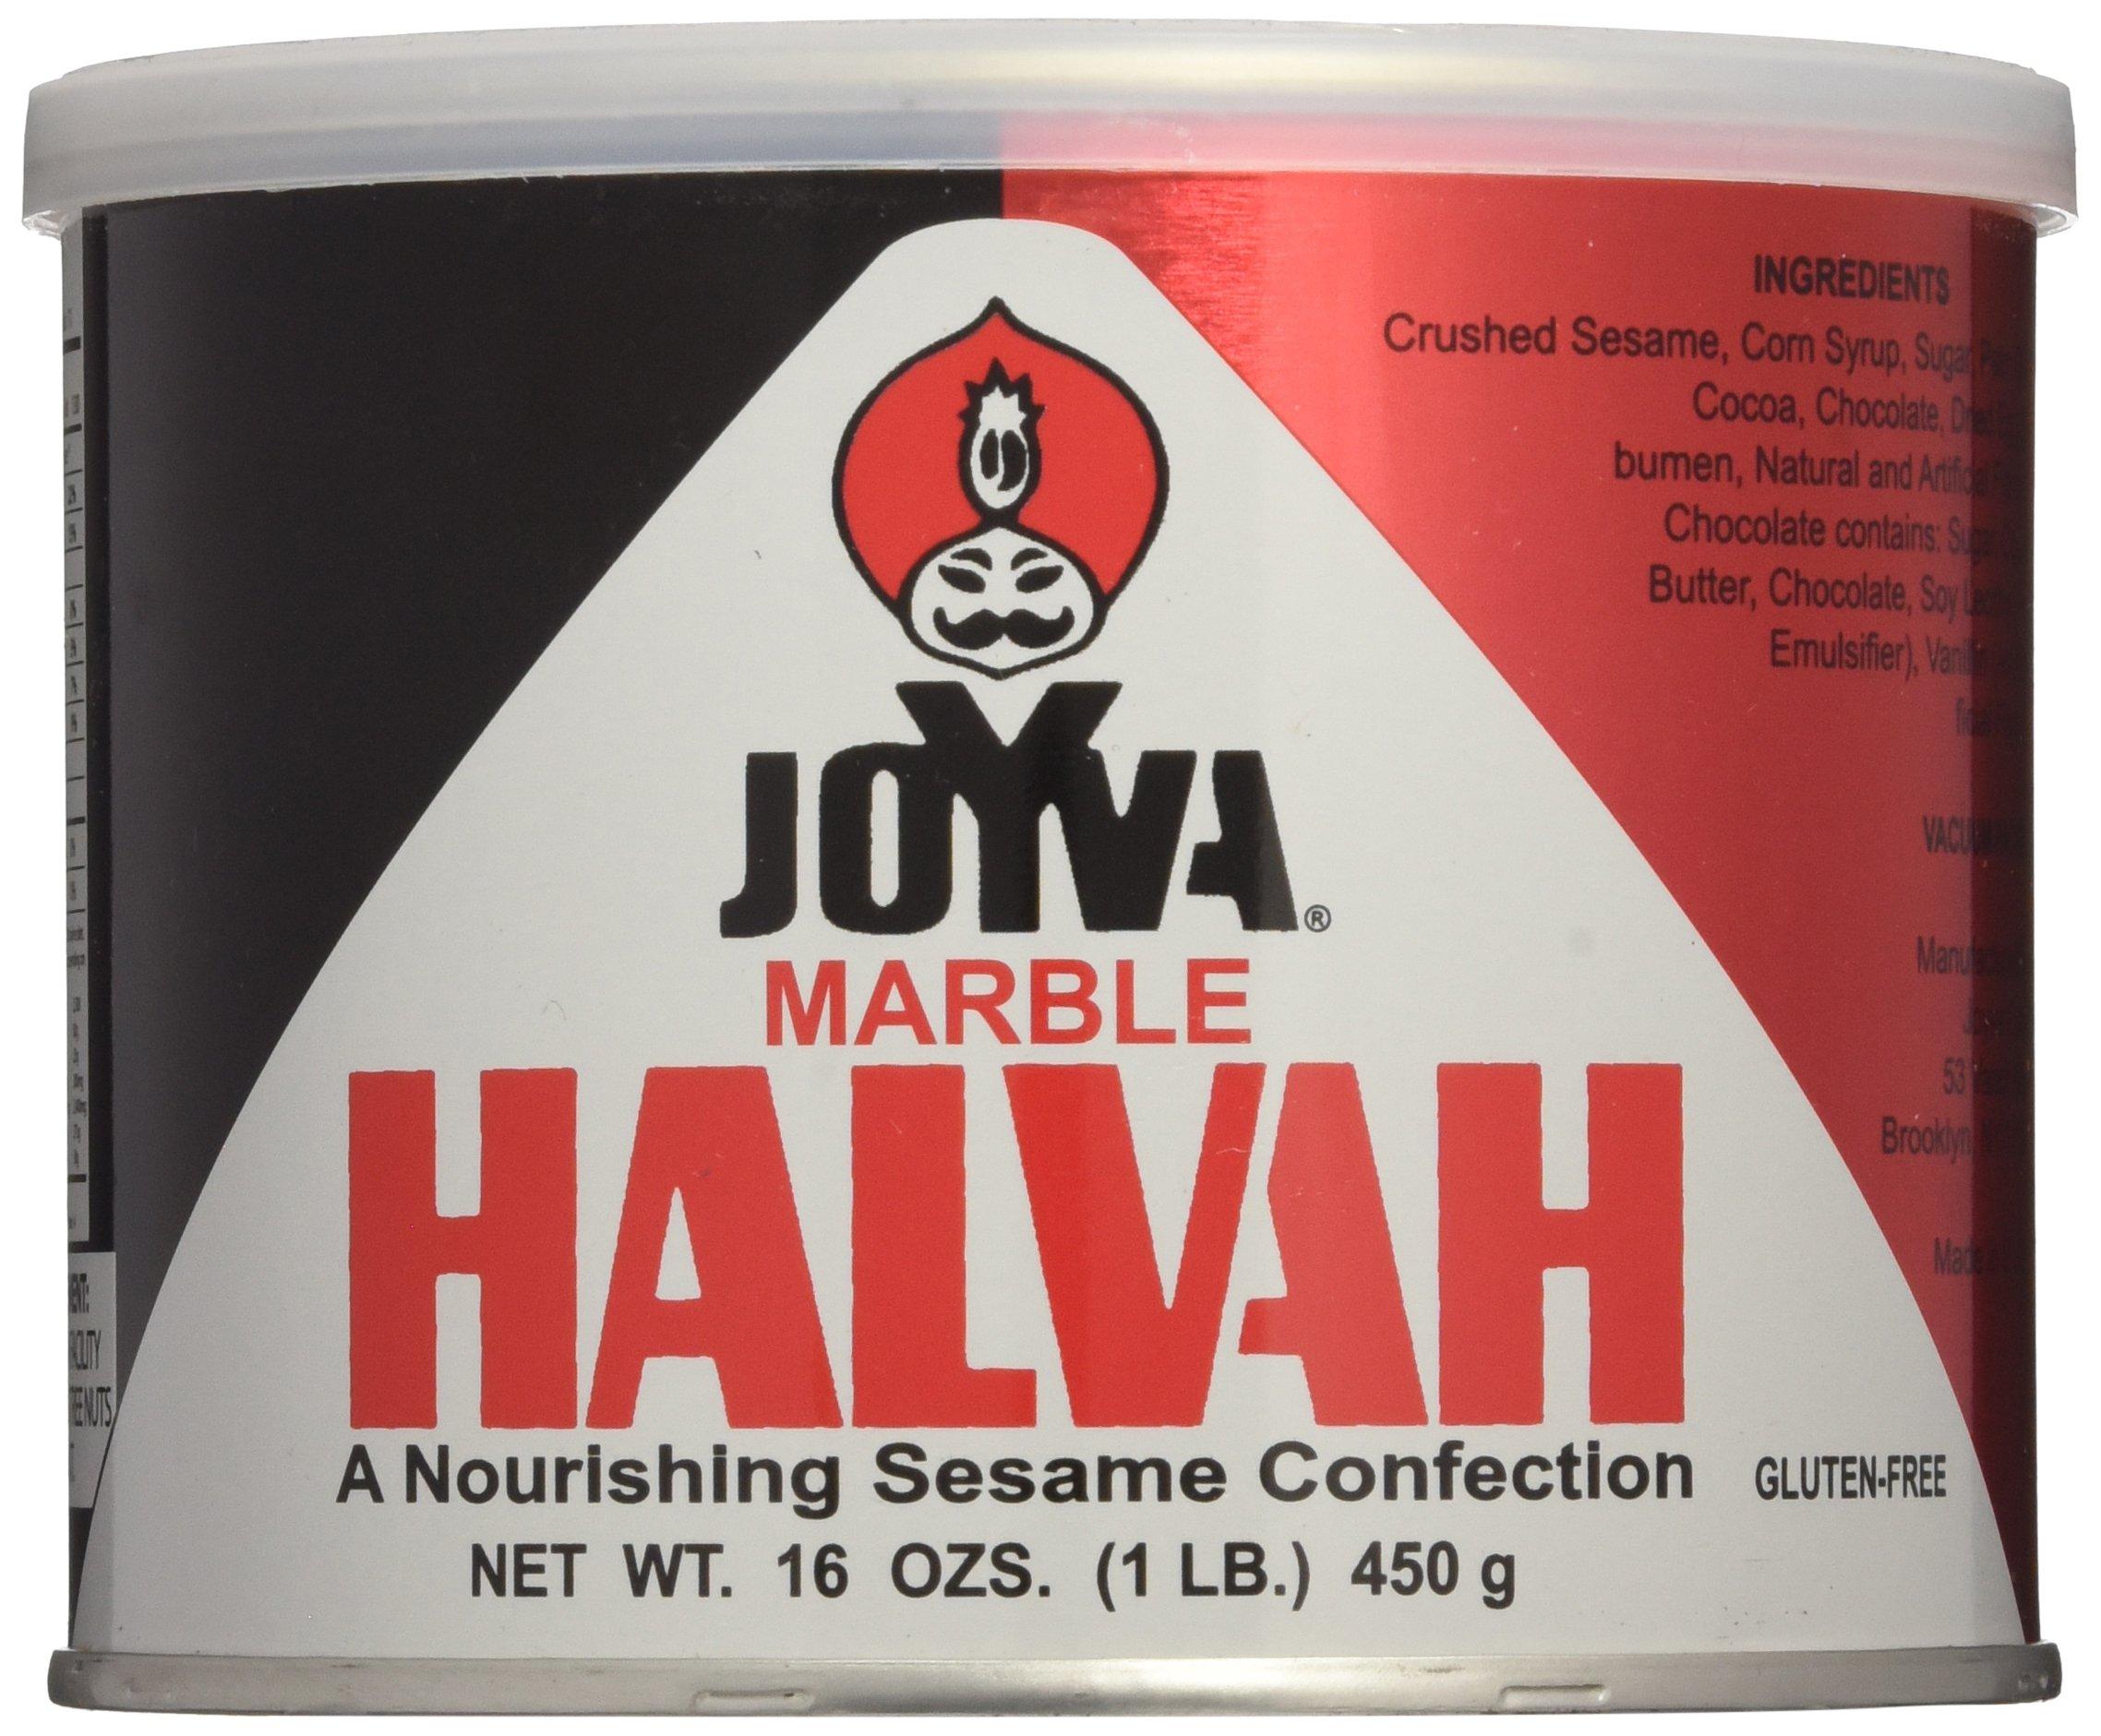 Joyva Marble Halvah, 16-Ounce Cans (Pack of 3) by Joyva